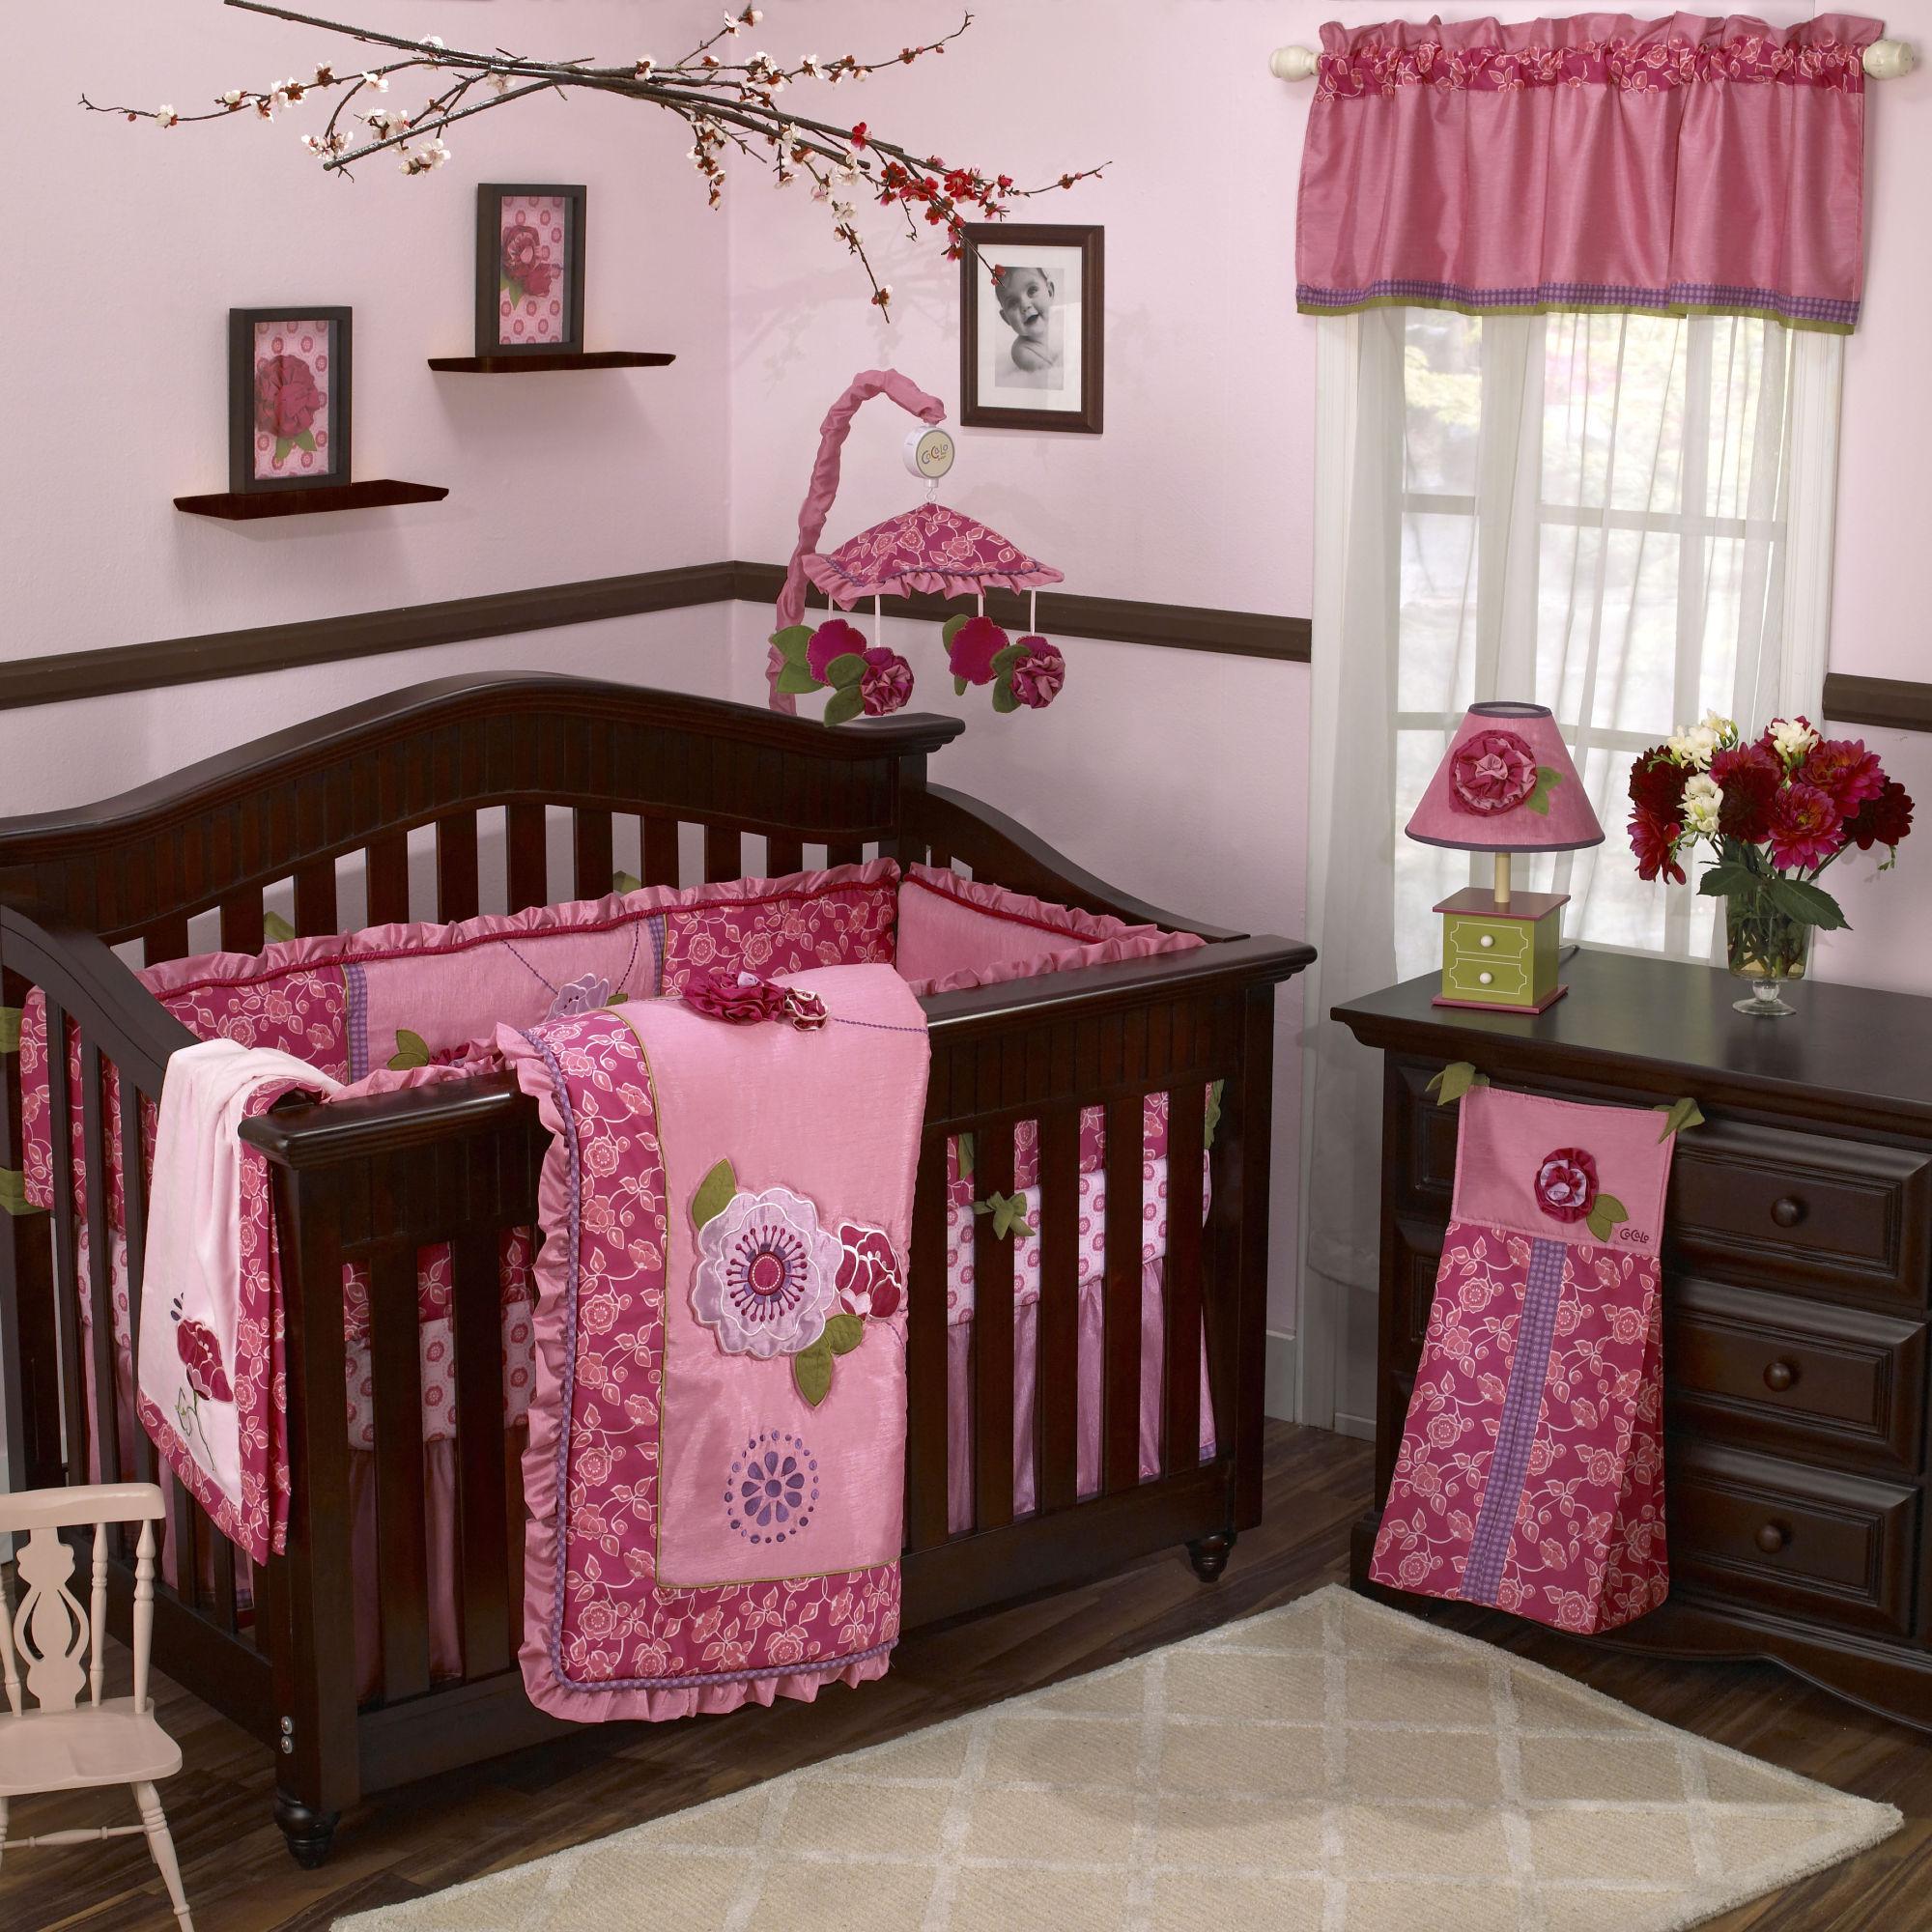 baby girl bedroom decor photo - 1